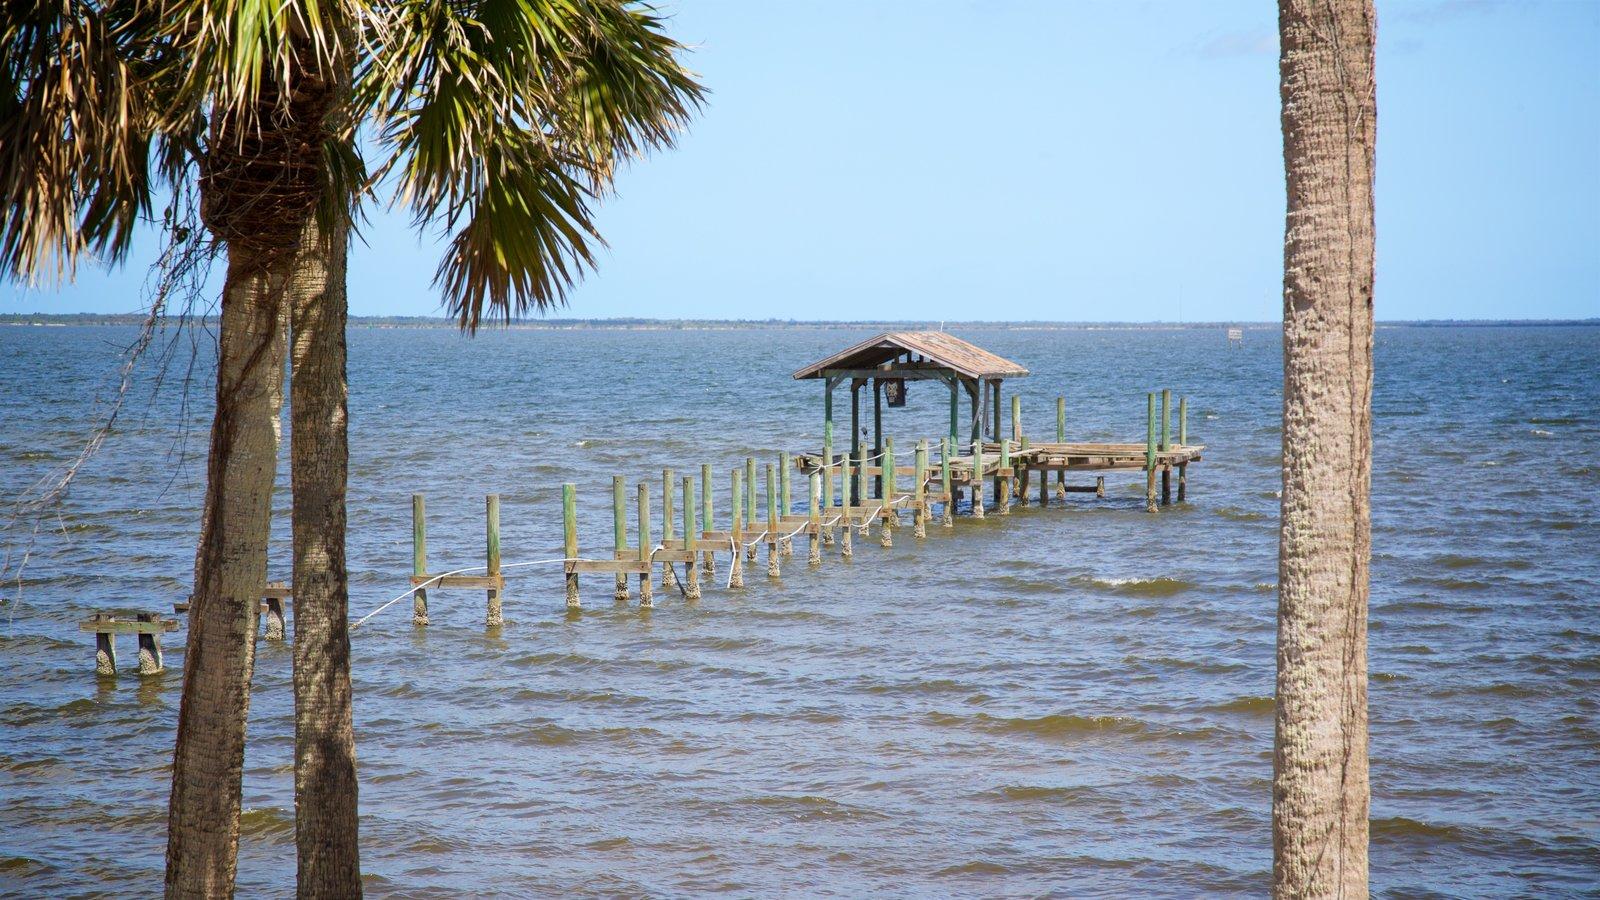 Titusville featuring general coastal views